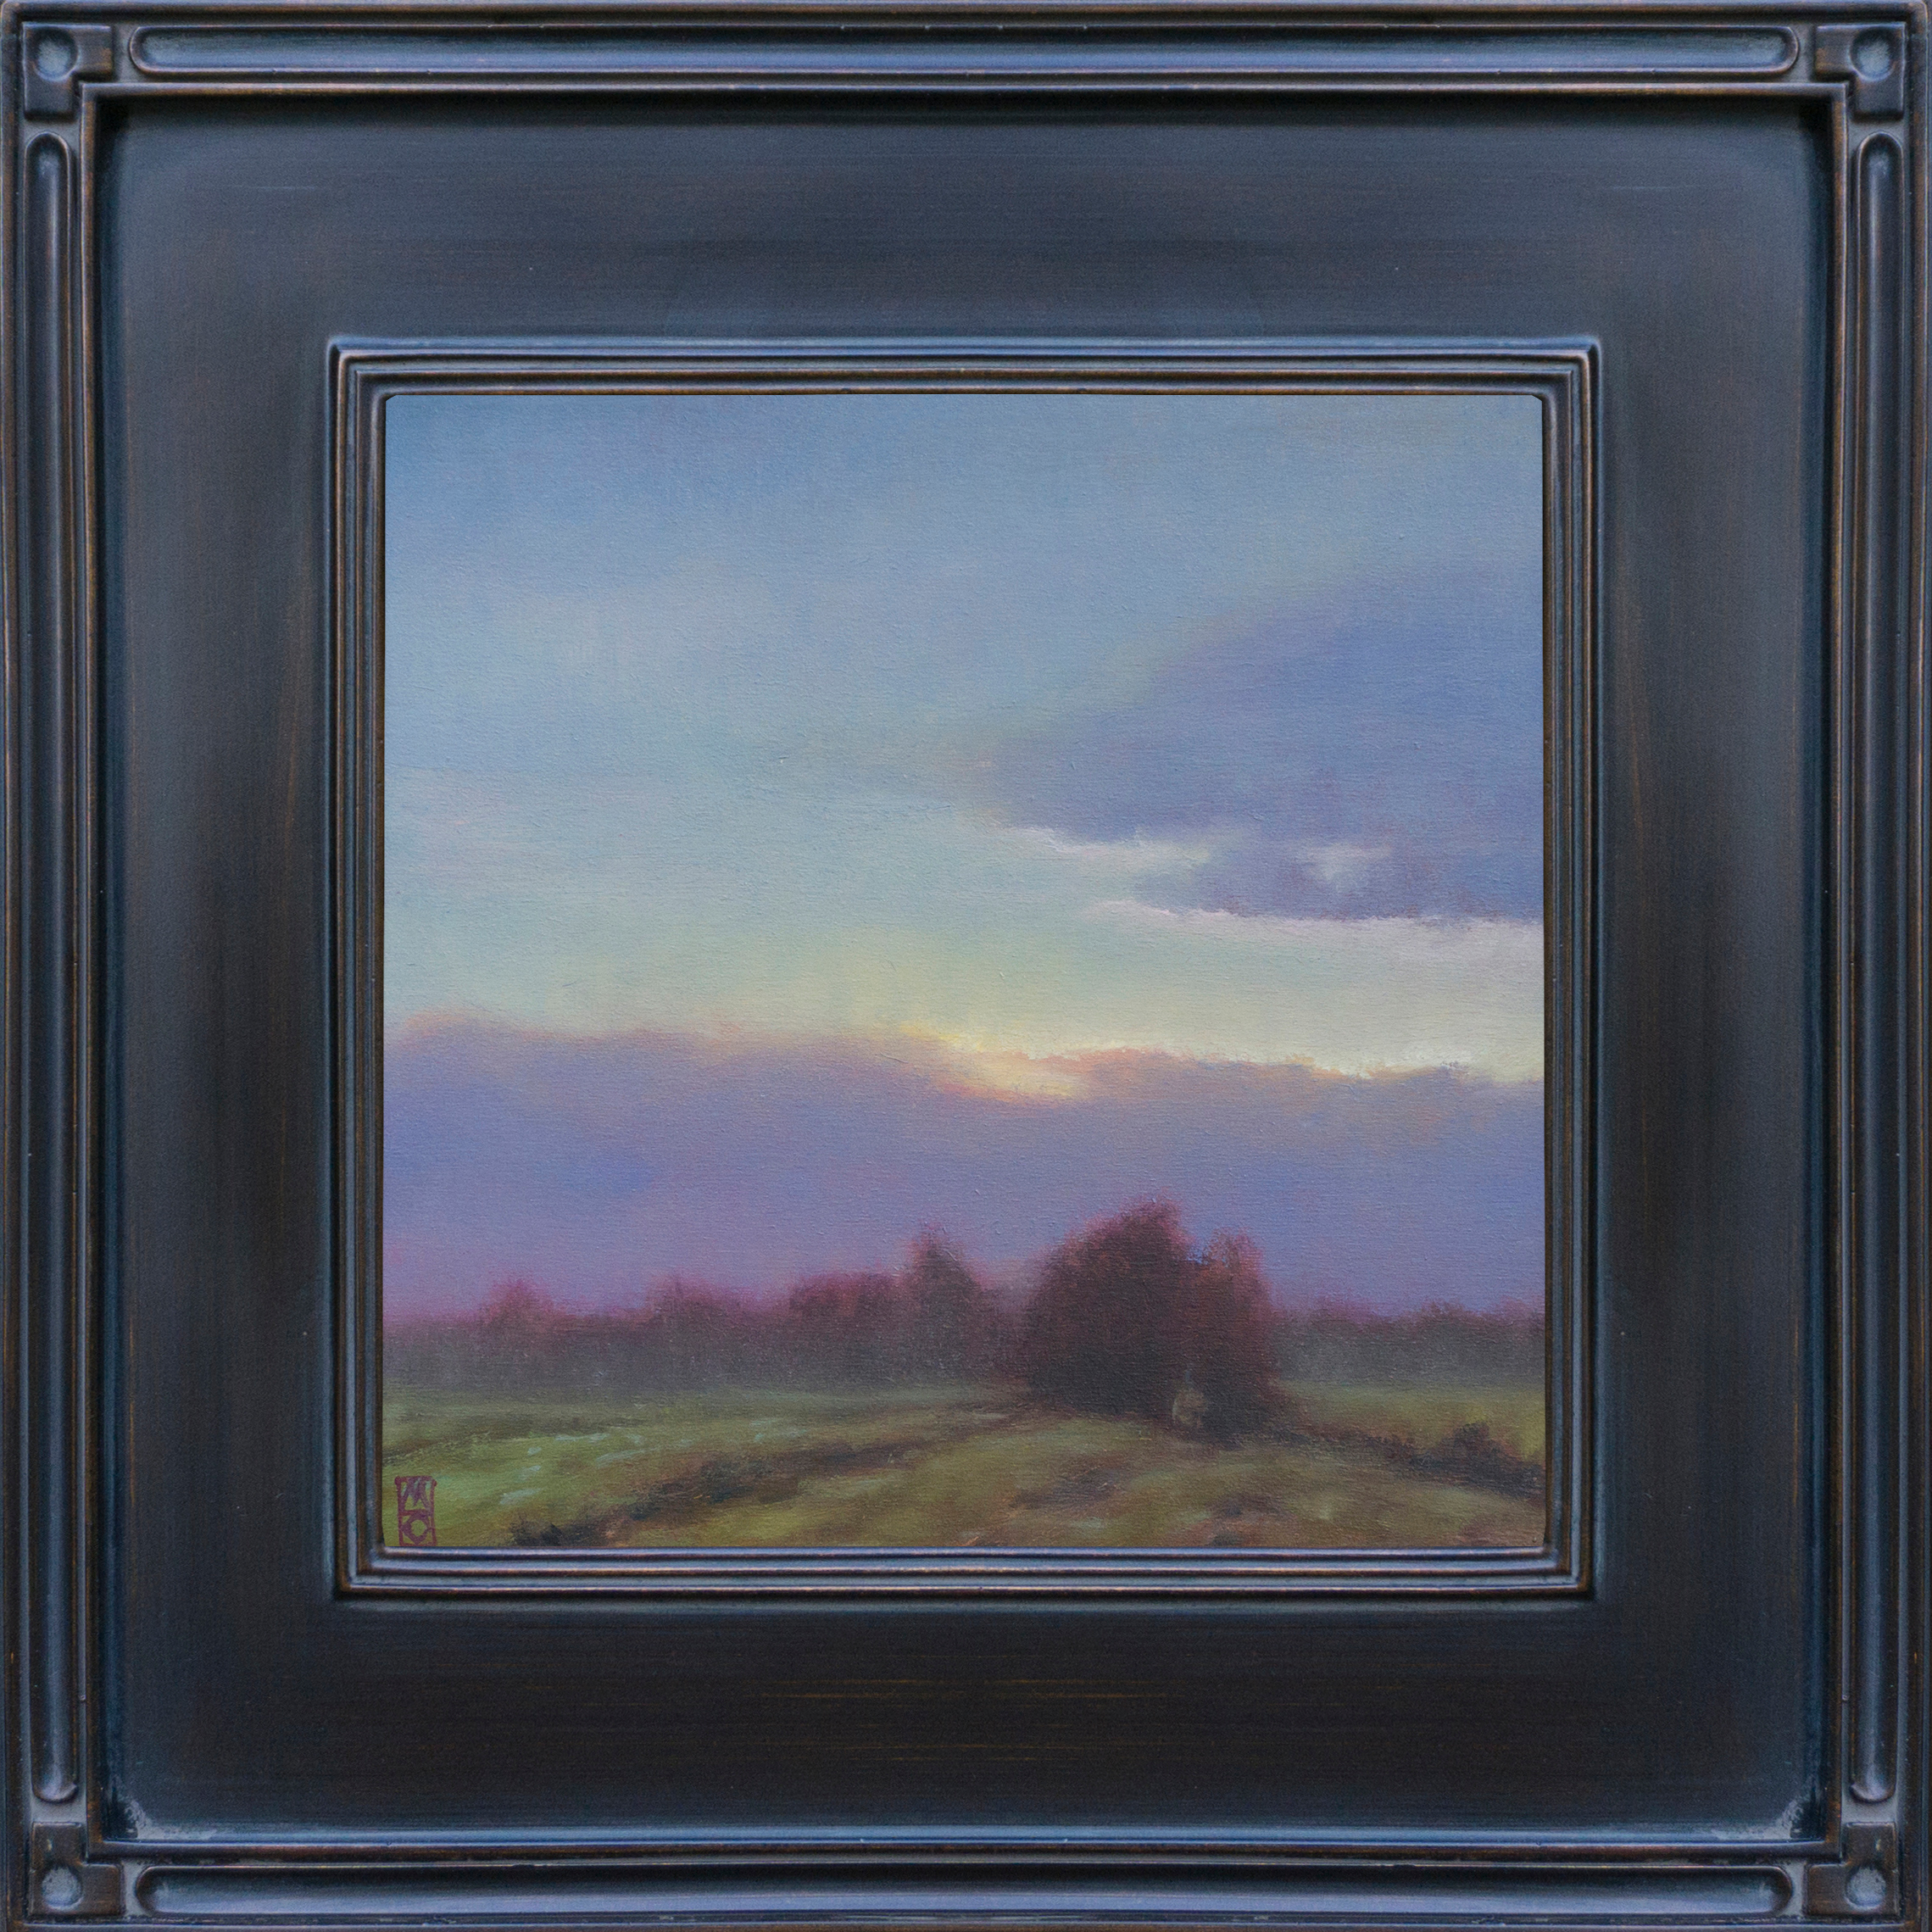 18 003 grazing land 12x12 micahel orwick framed aniidr